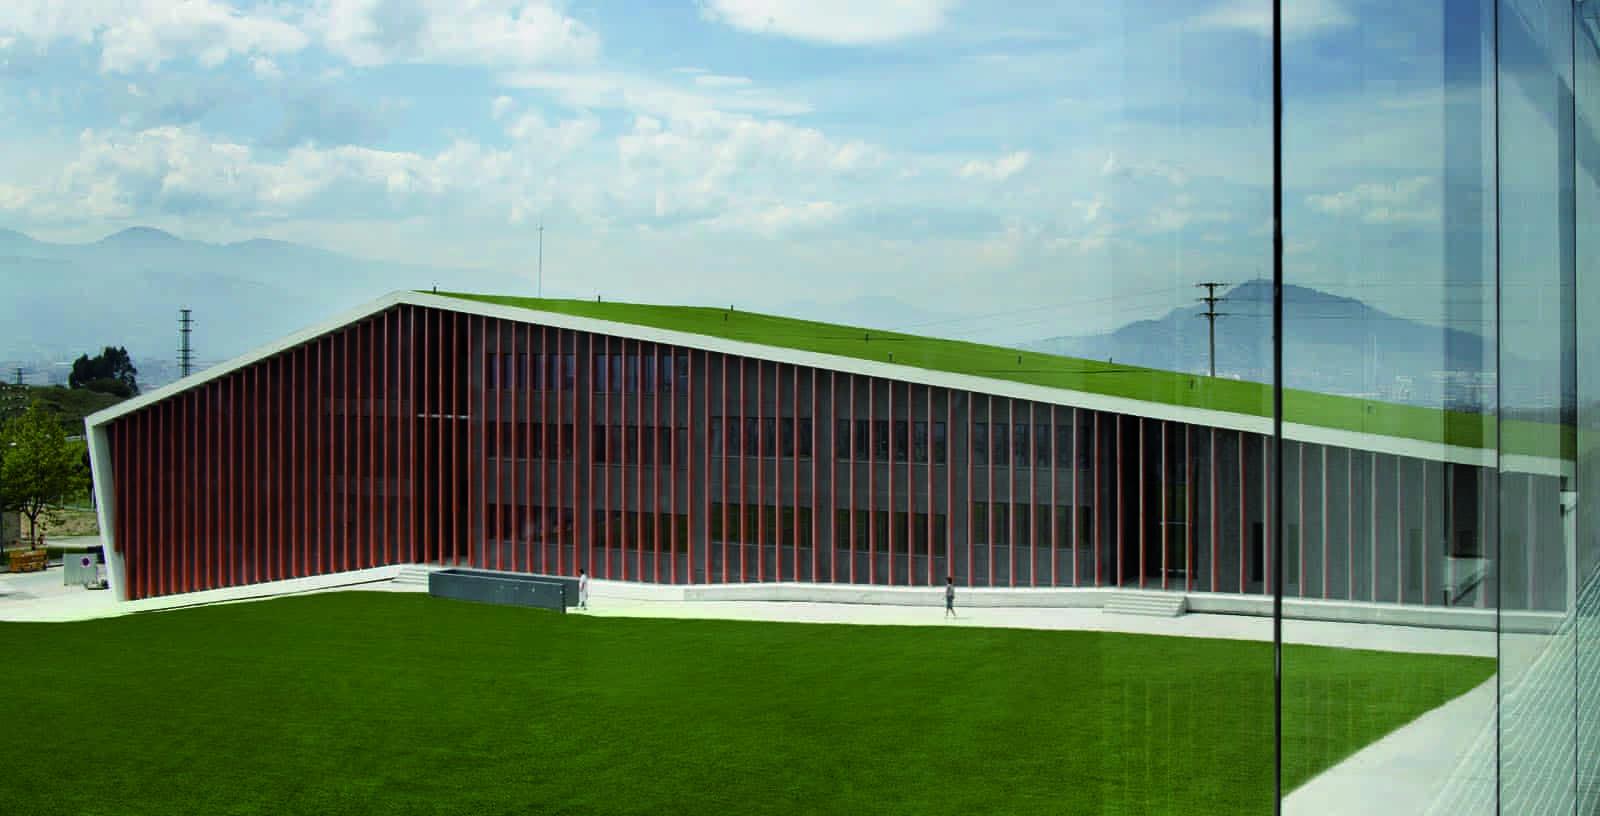 Teacher_Training_School_03_Architecture_Idom_photos_Aitor_Ortiz